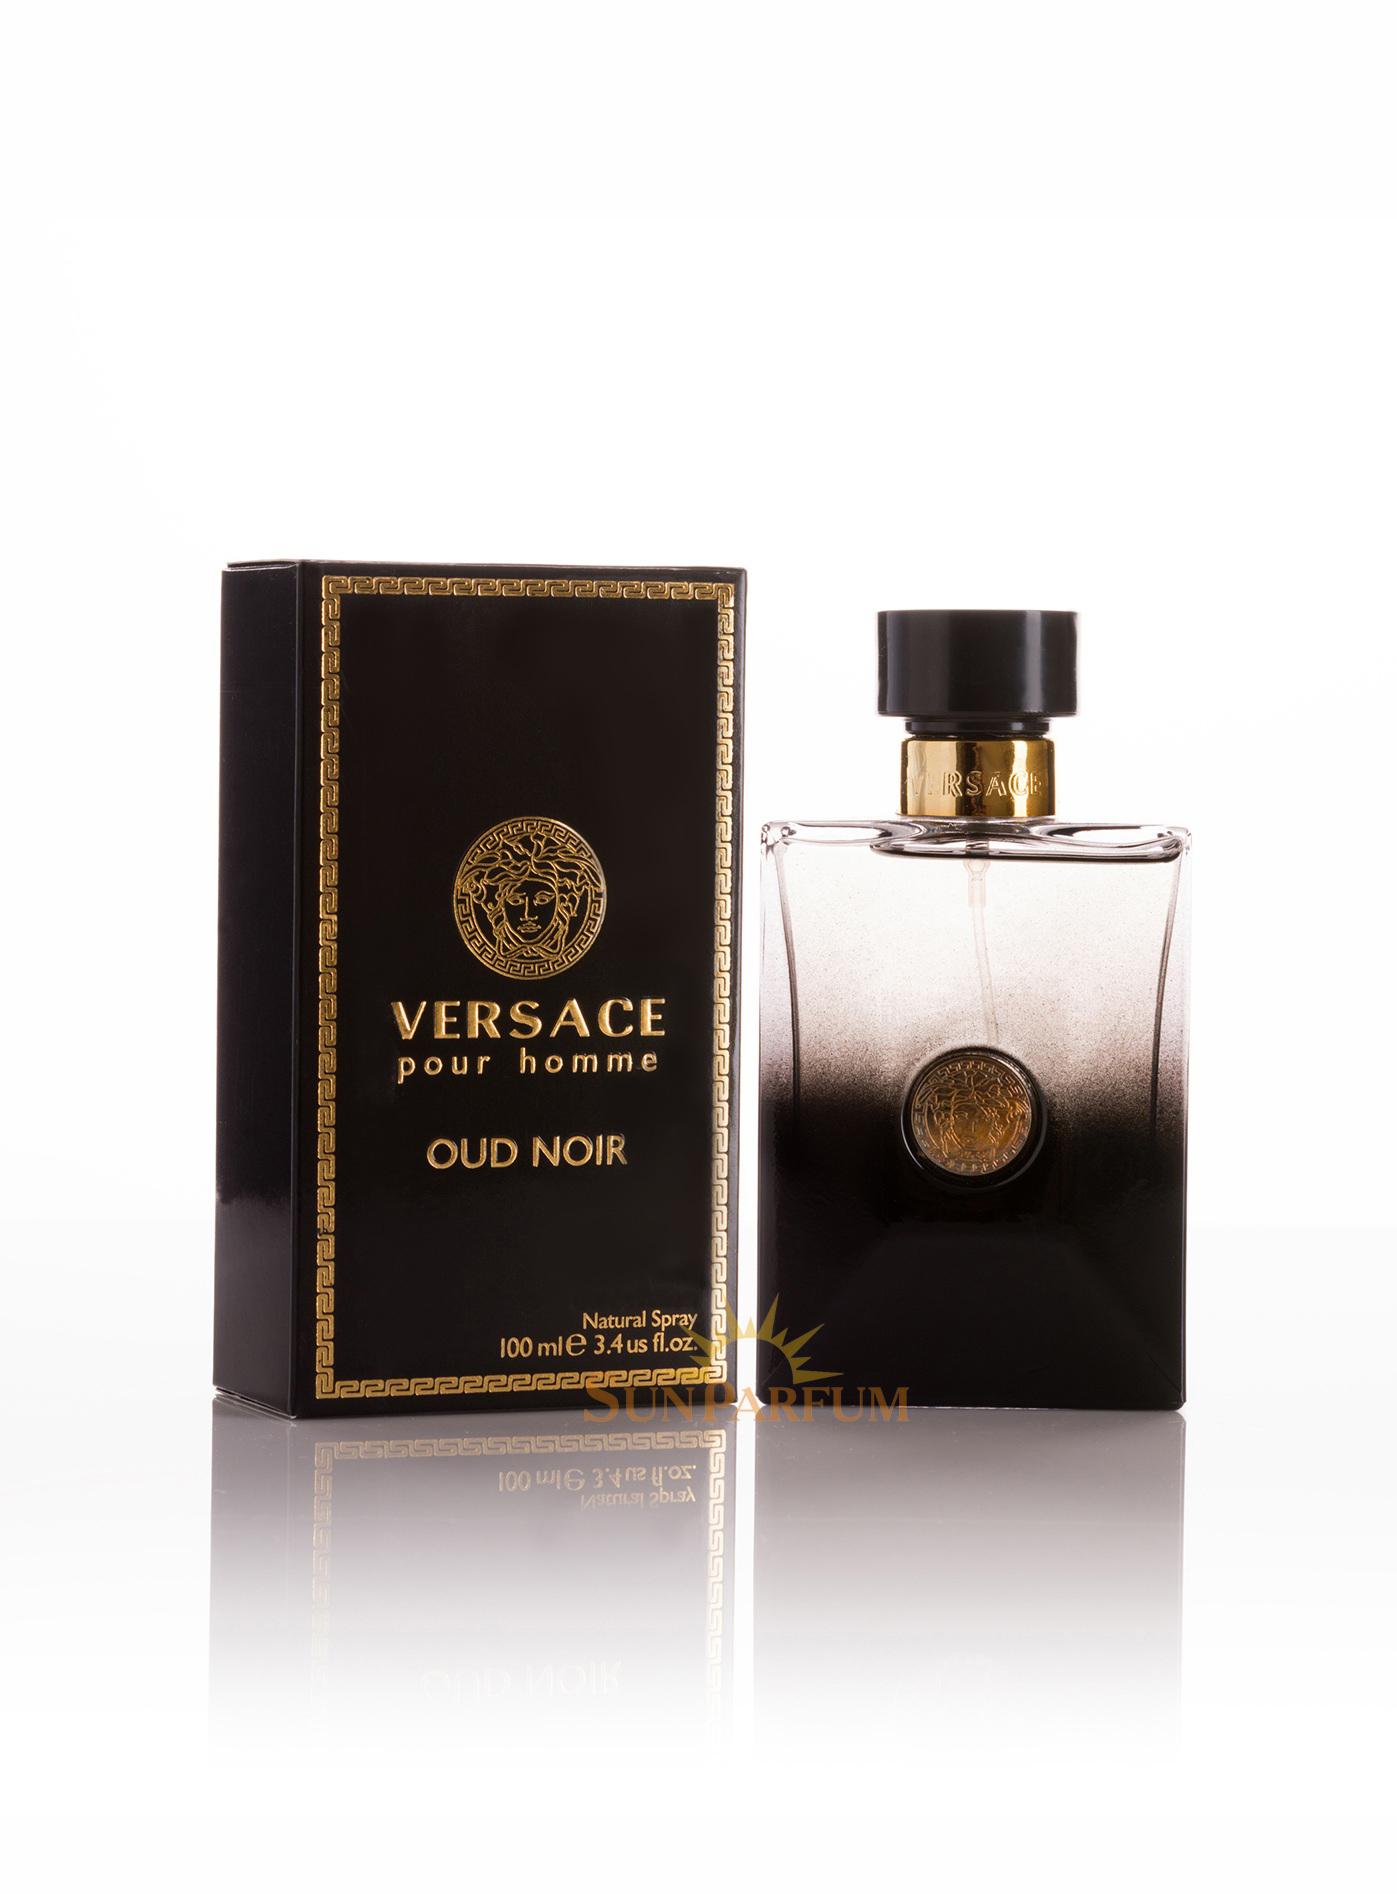 мужские духи Versace Oud Noir Pour Homme 100 мл цена отзывы